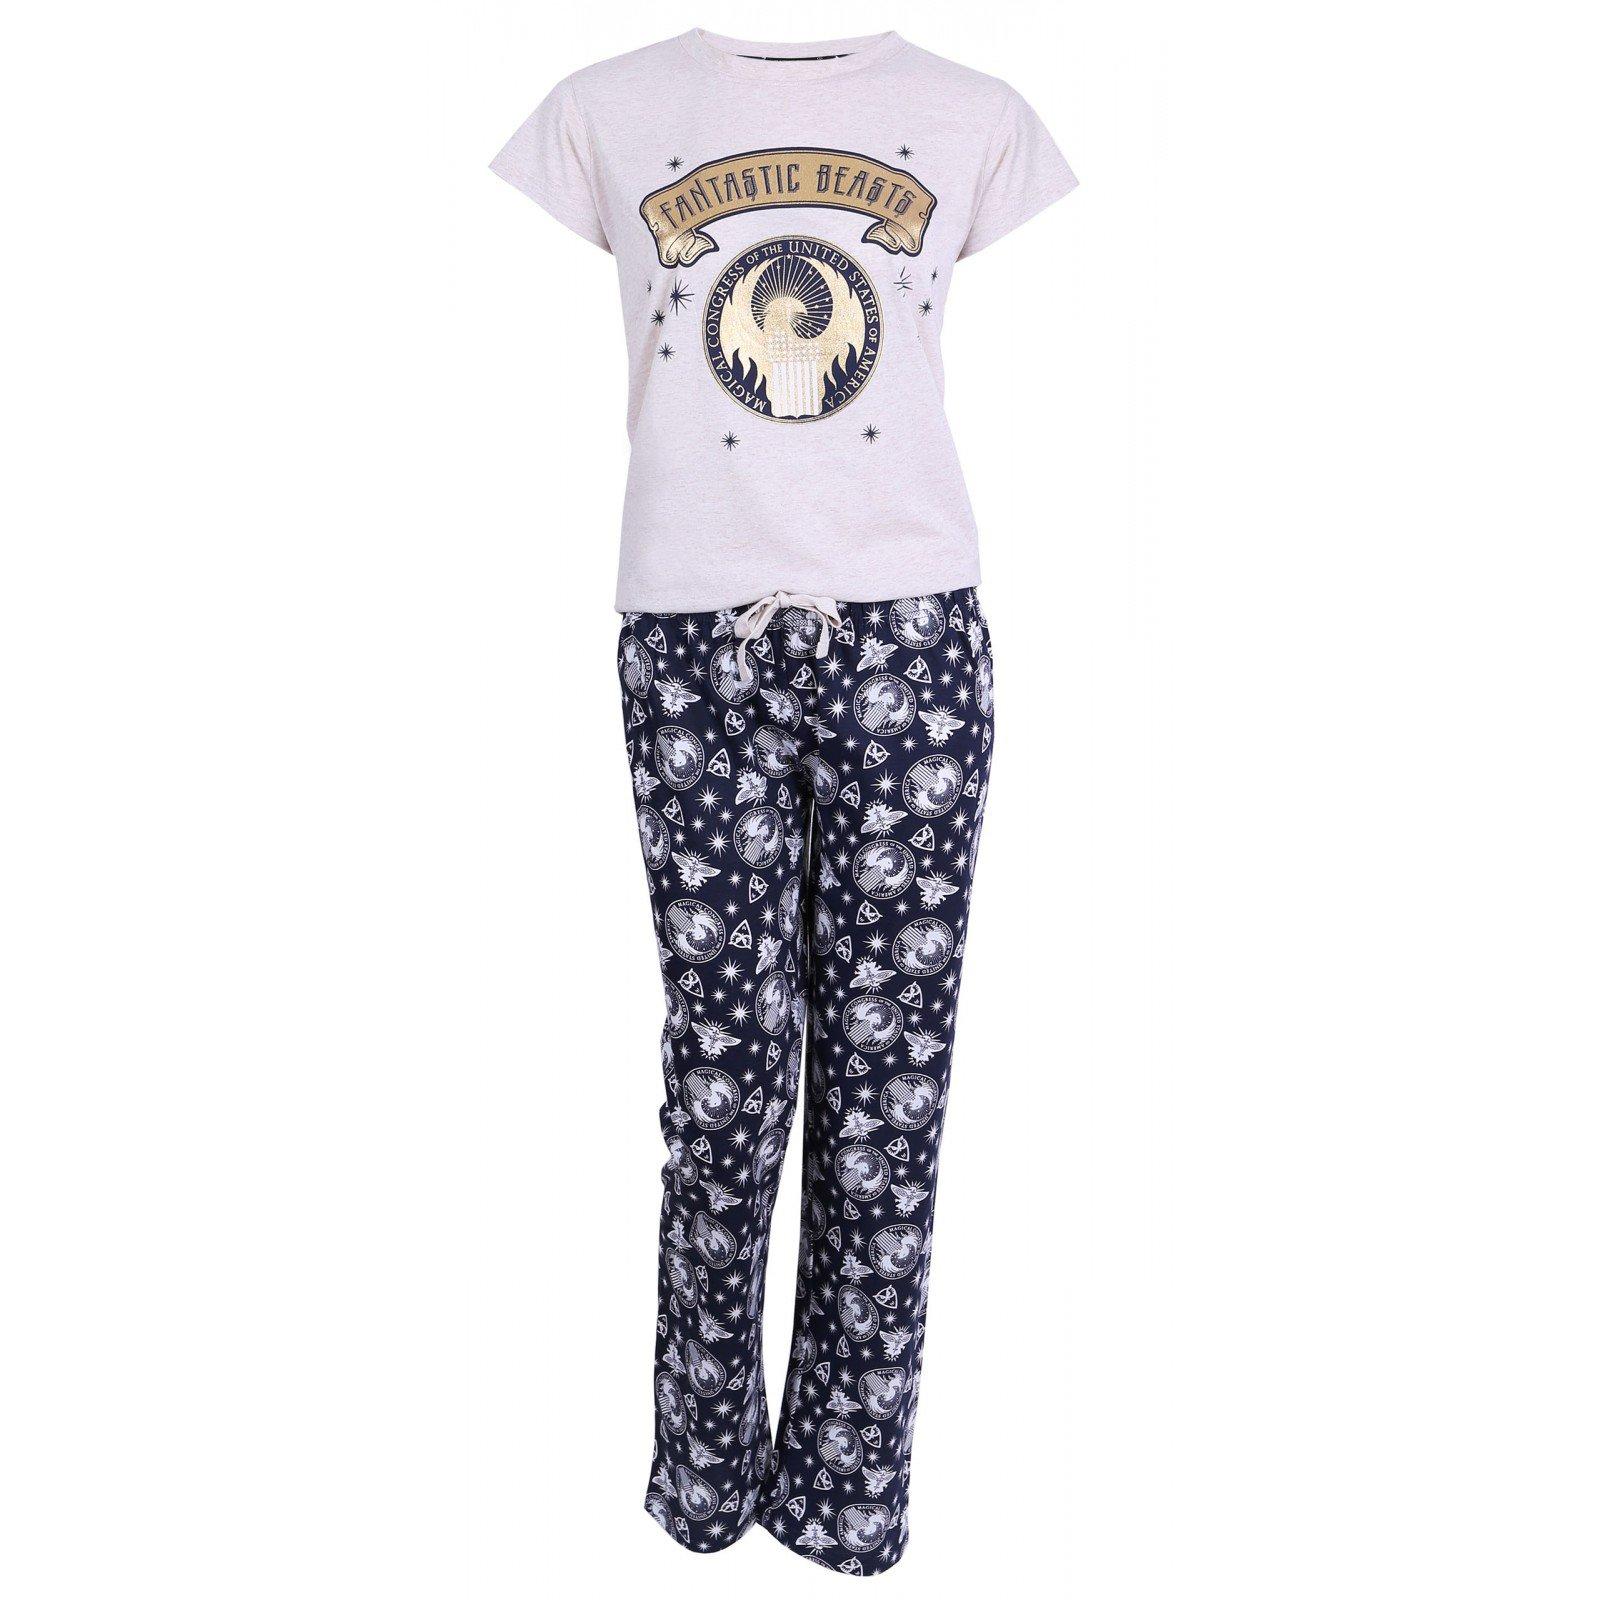 Beżowo-granatowa piżama Fantastic Beasts 46-48